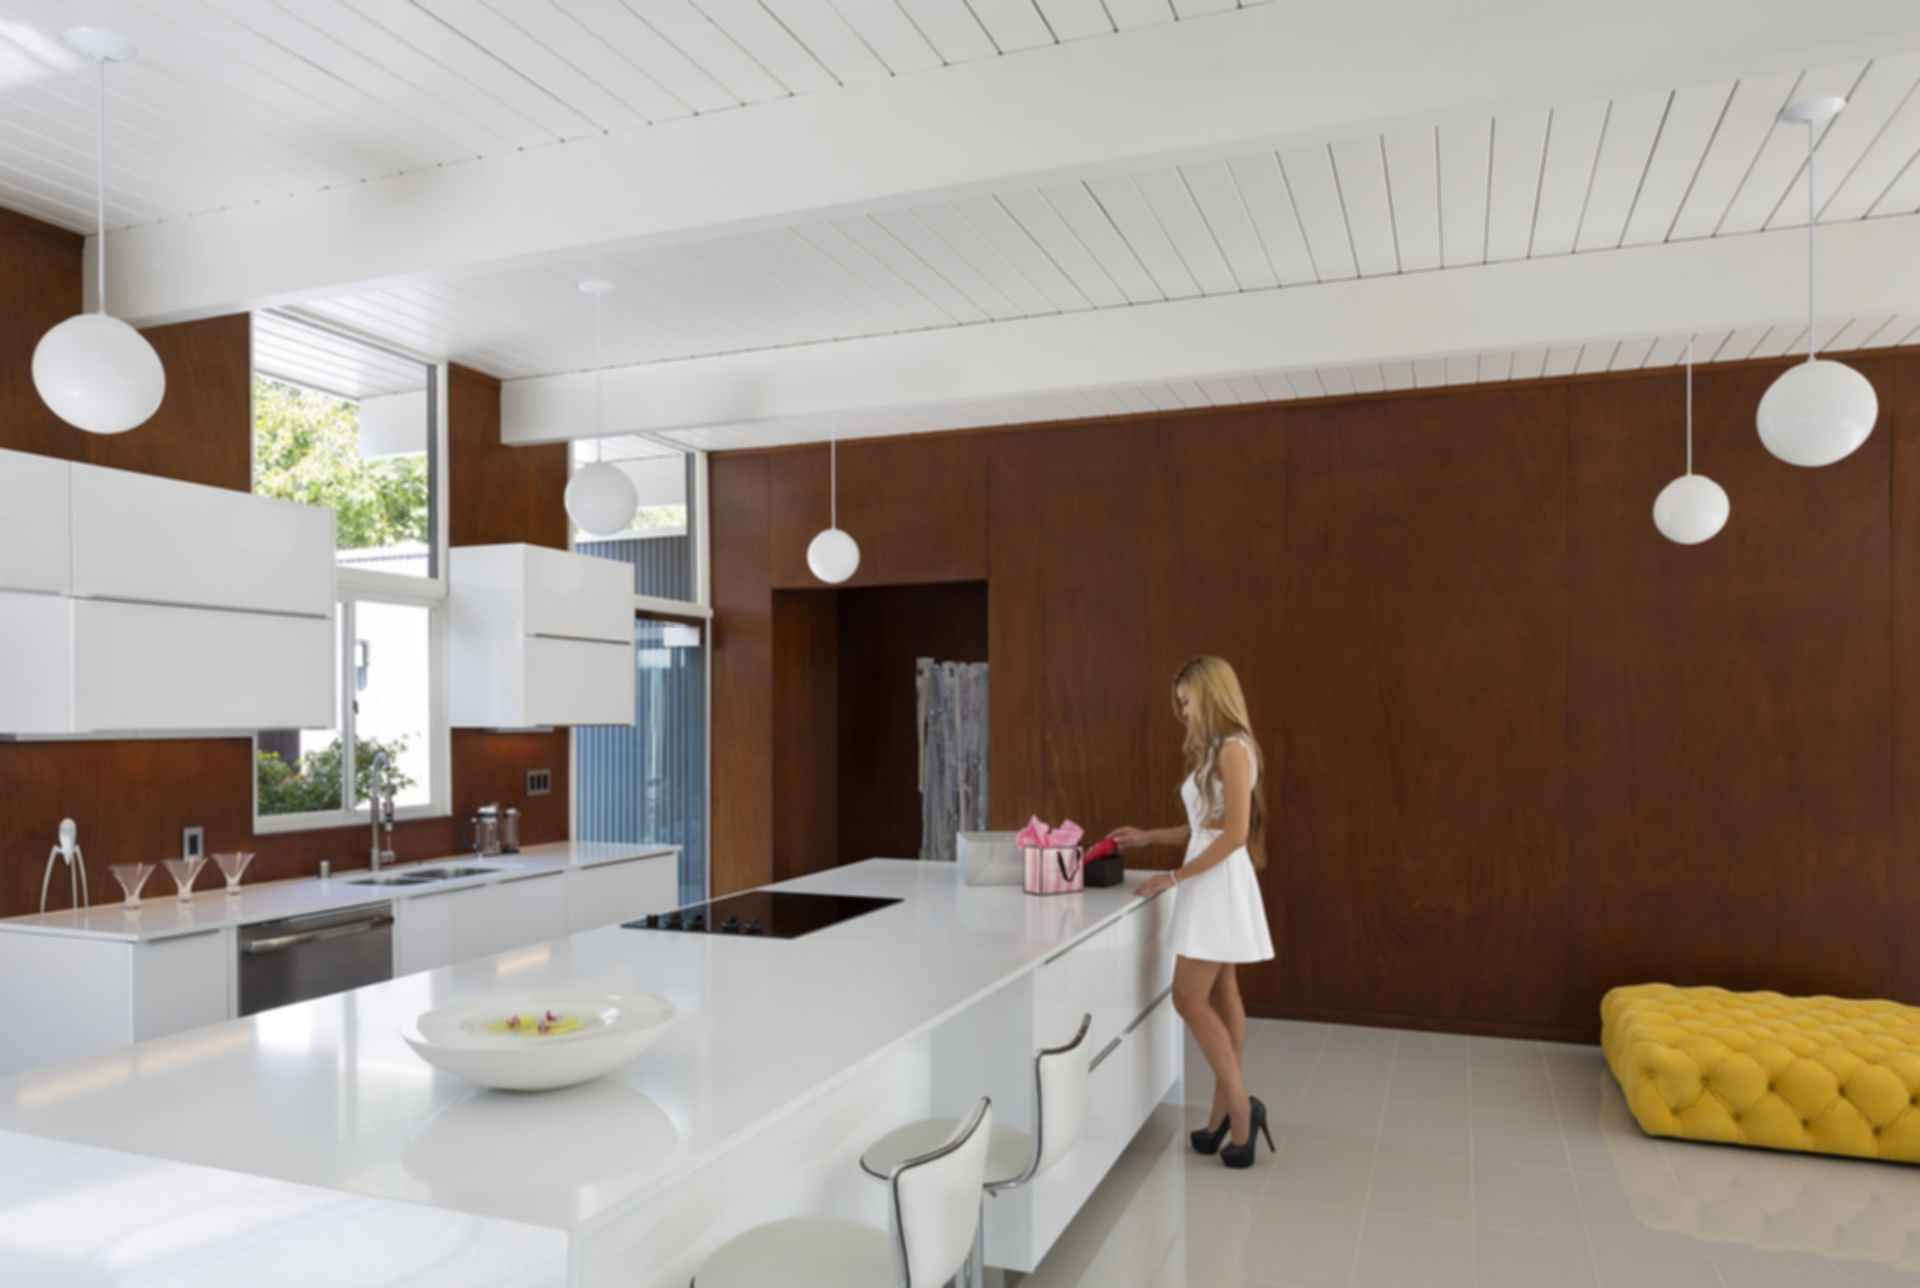 Ross Street Eichler Remodel - Kitchen